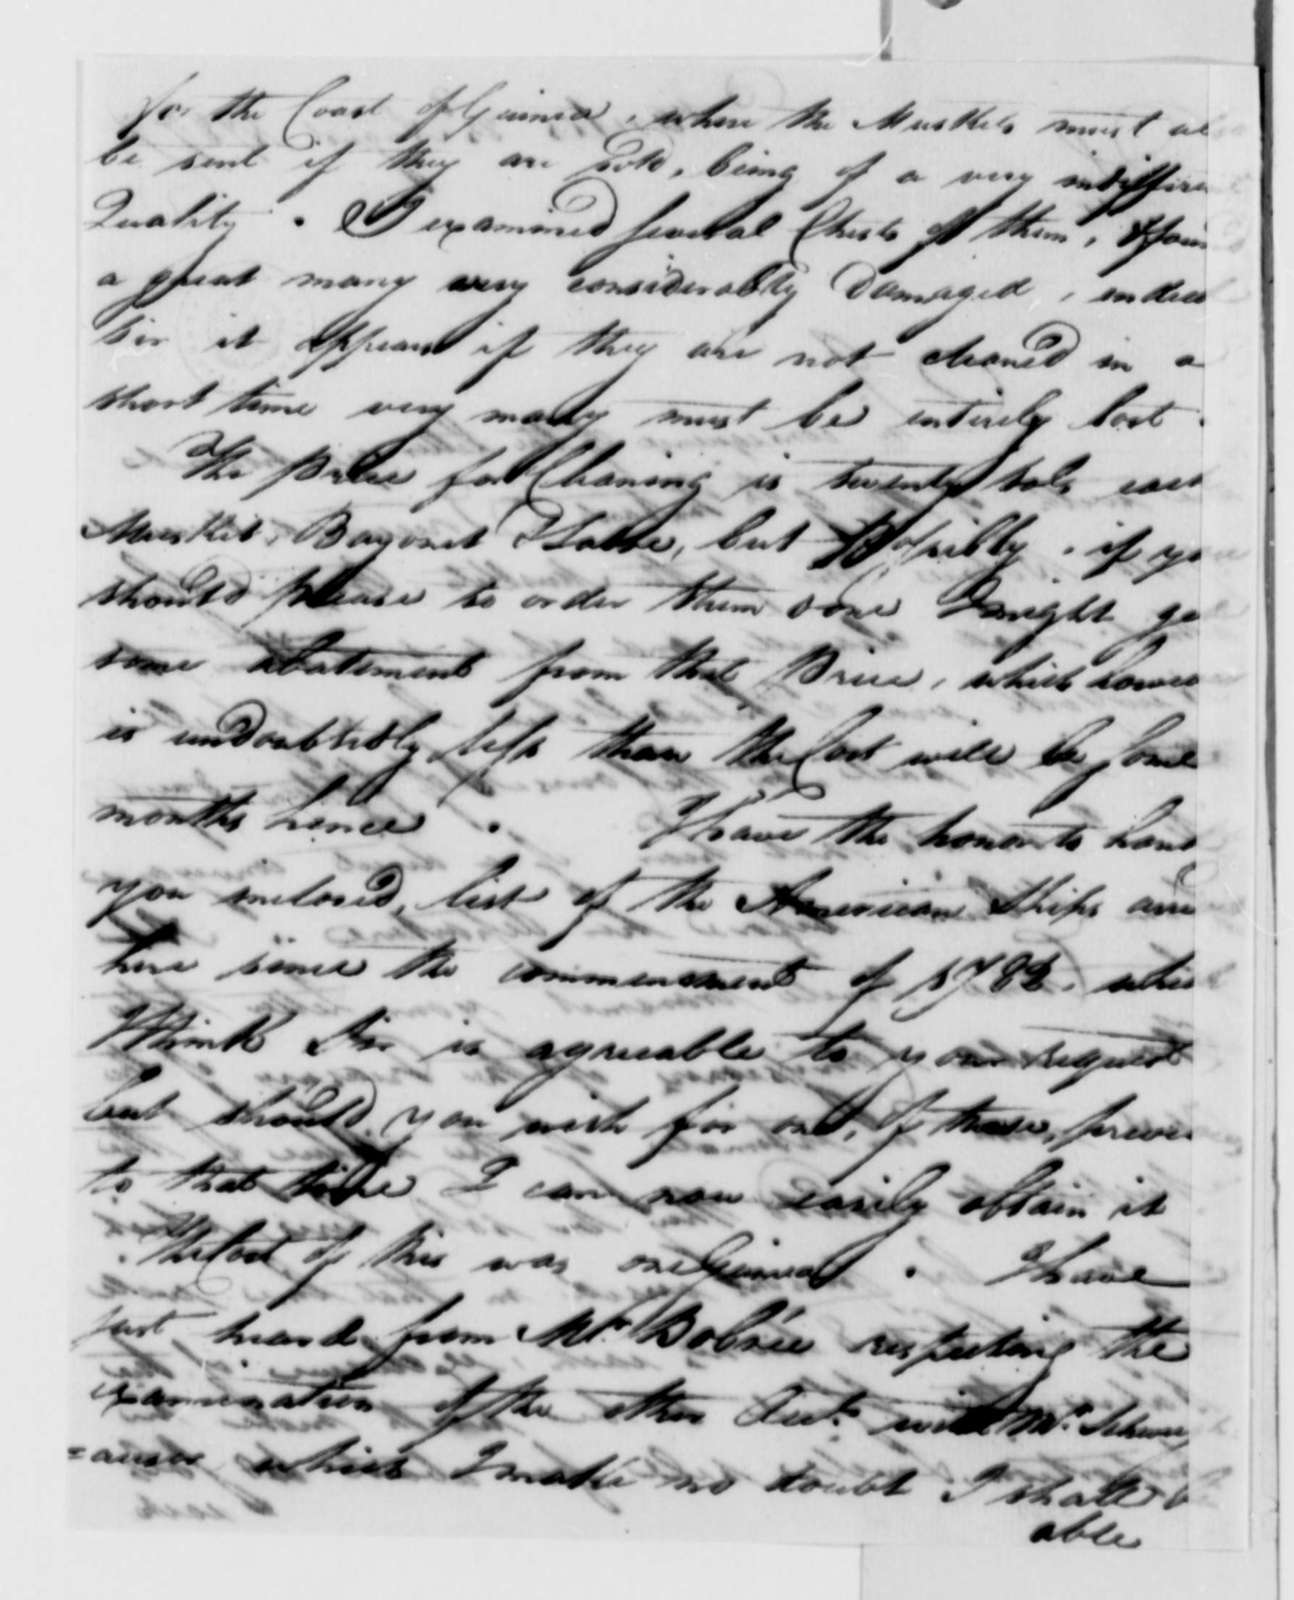 Burrill Carnes to Thomas Jefferson, August 23, 1787